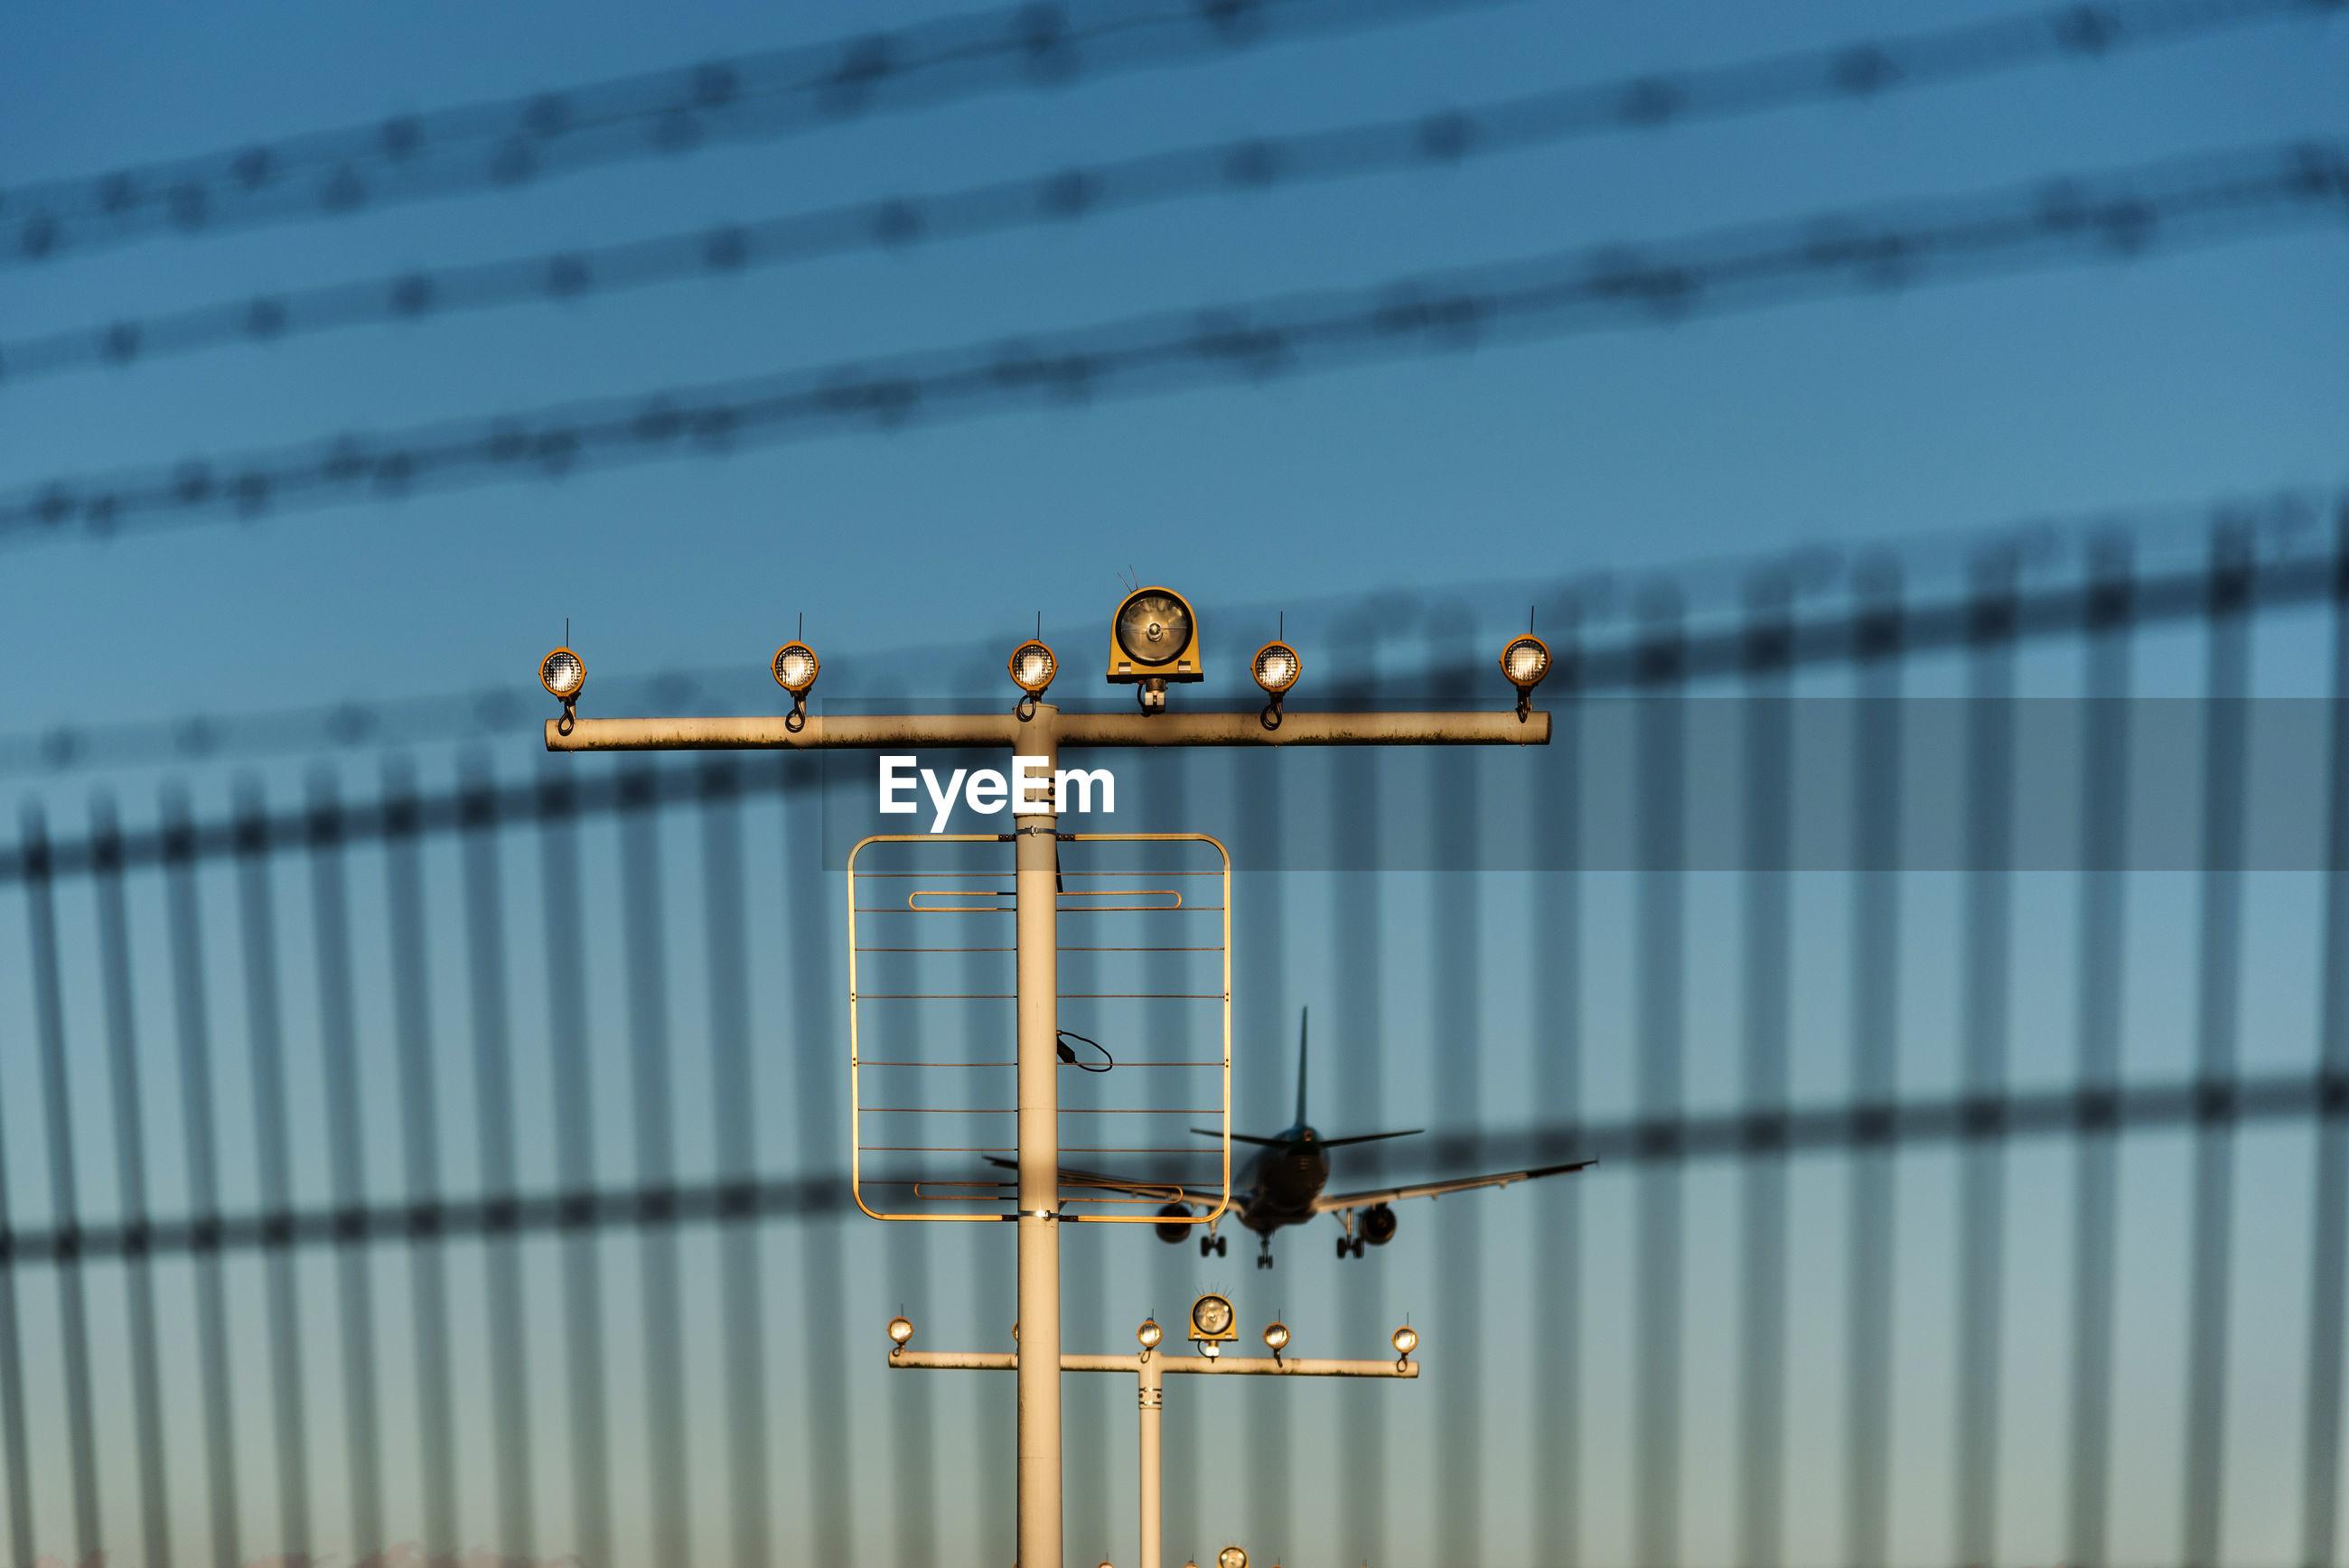 Landling passenger aircraft seen through security fence at airport